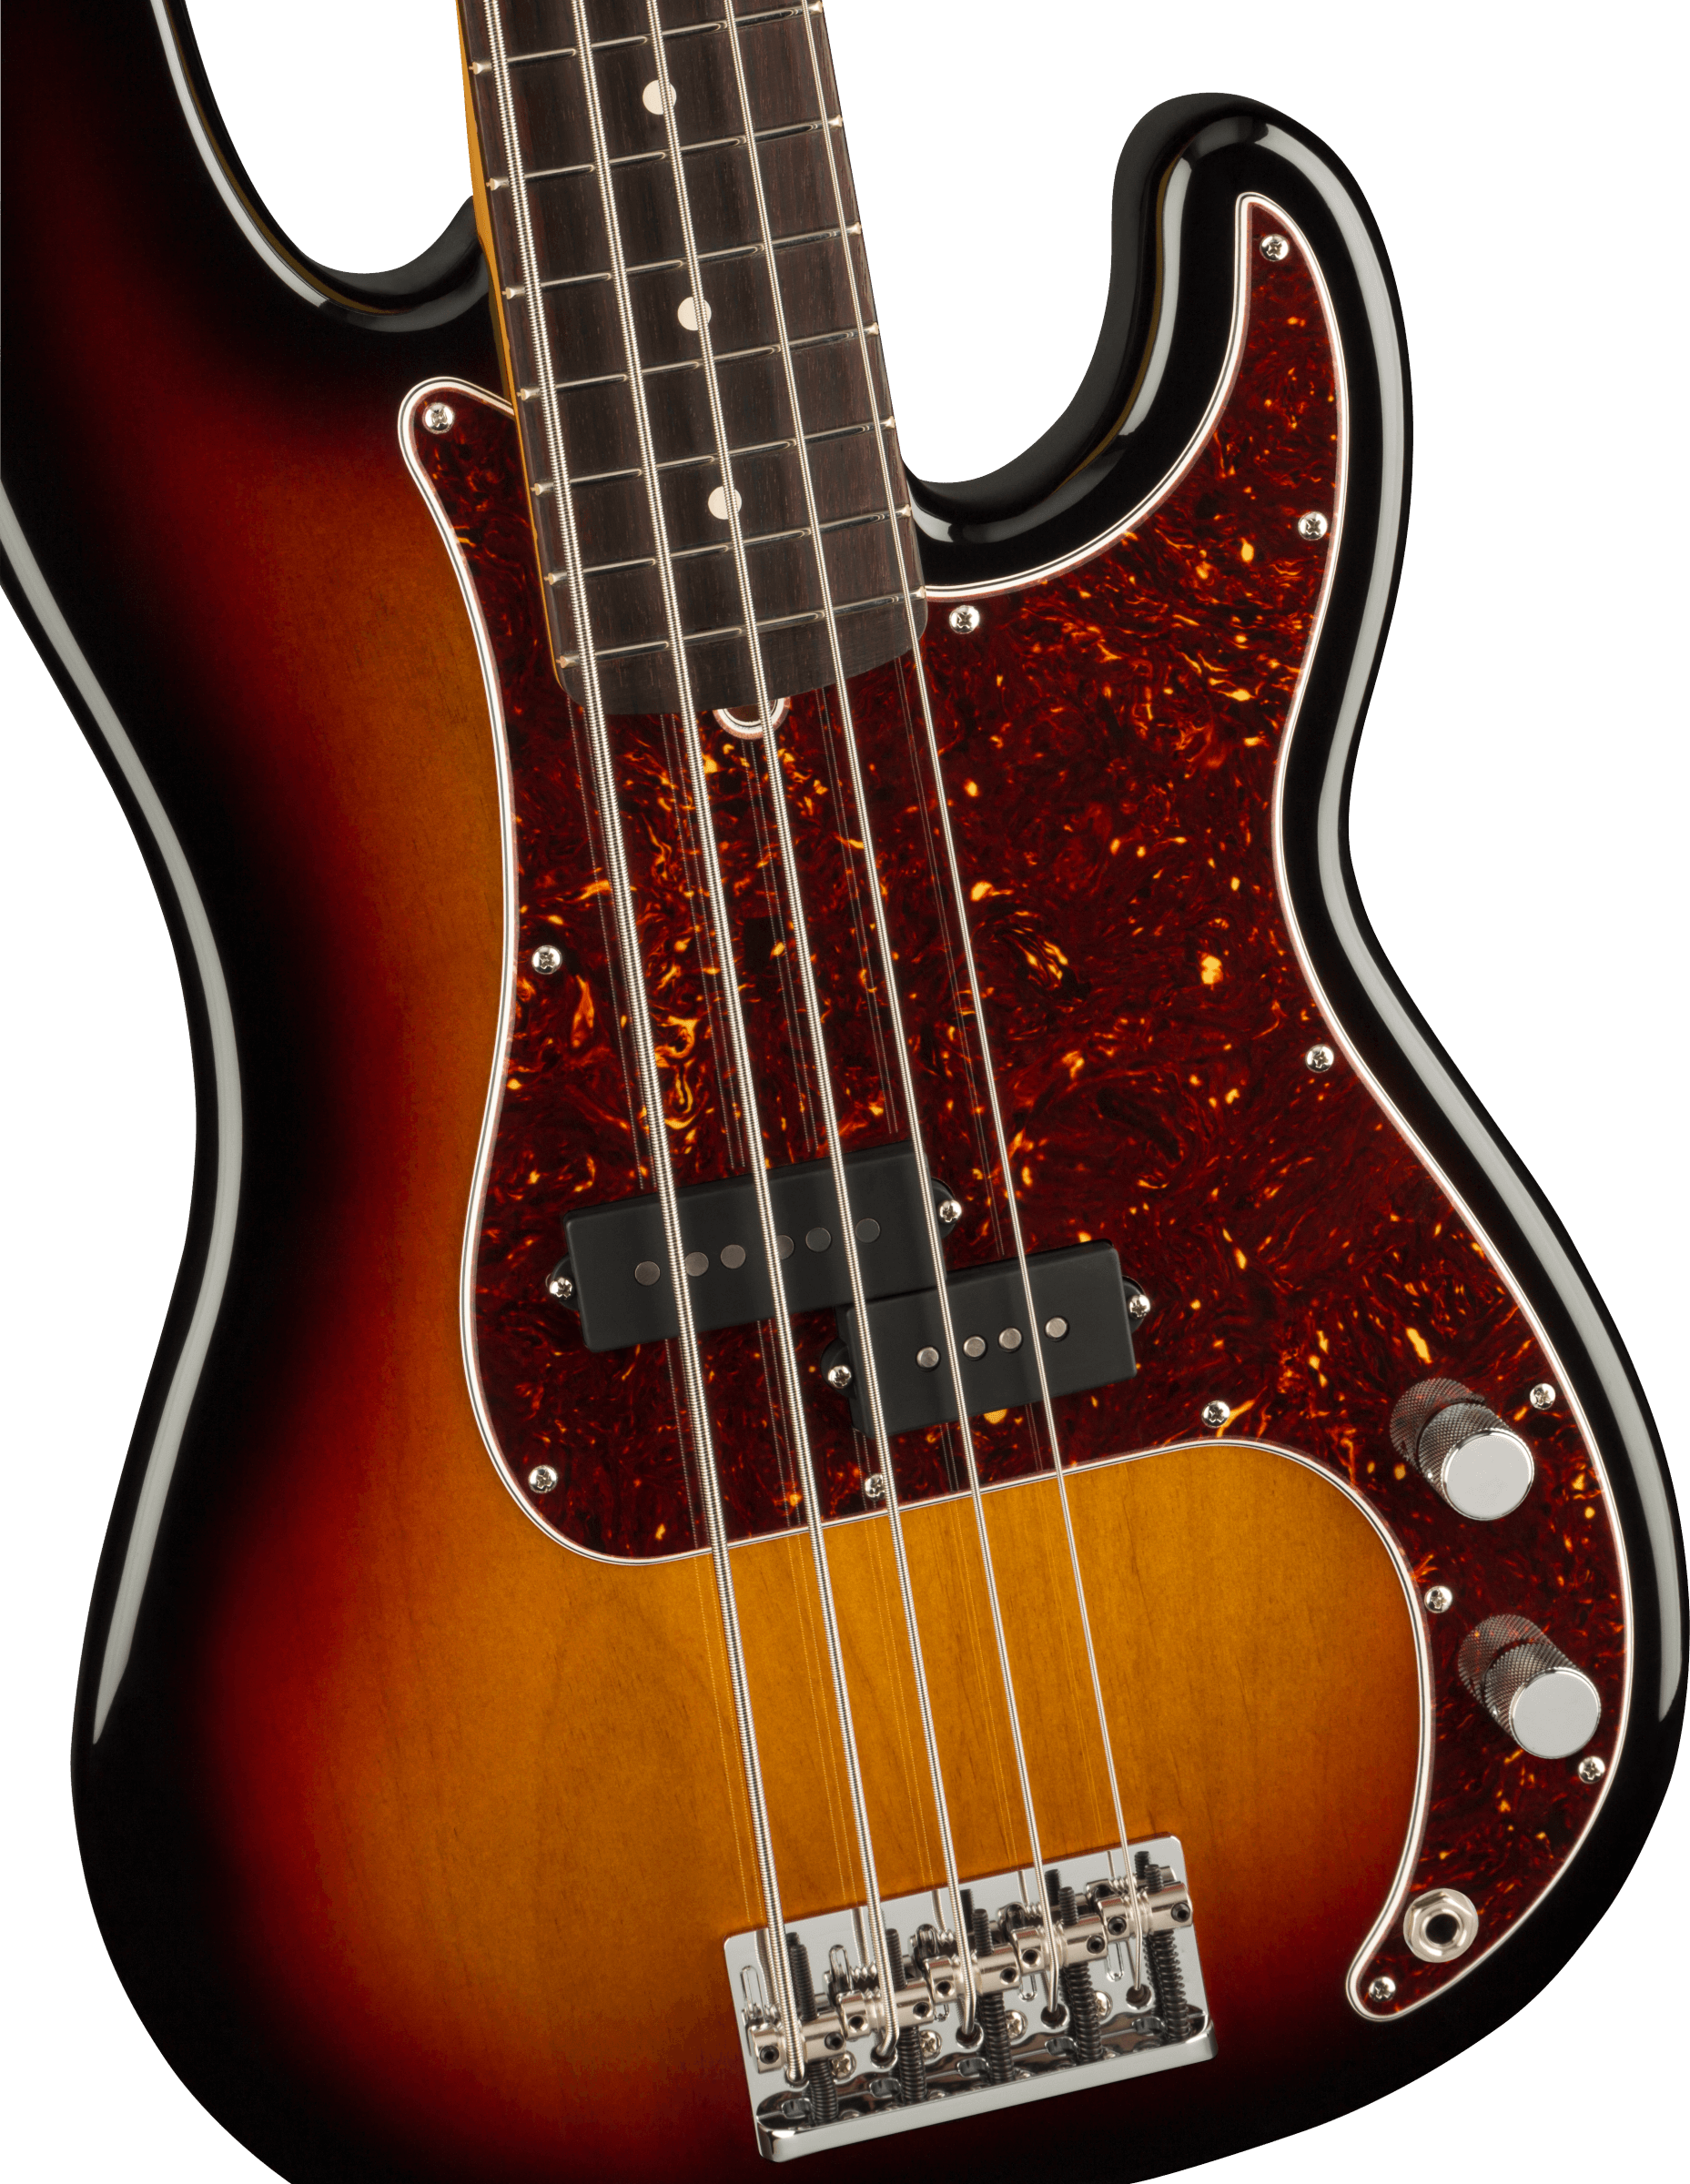 Fender American Professional II Precision Bass® V, Rosewood Fingerboard, 3-Color Sunburst